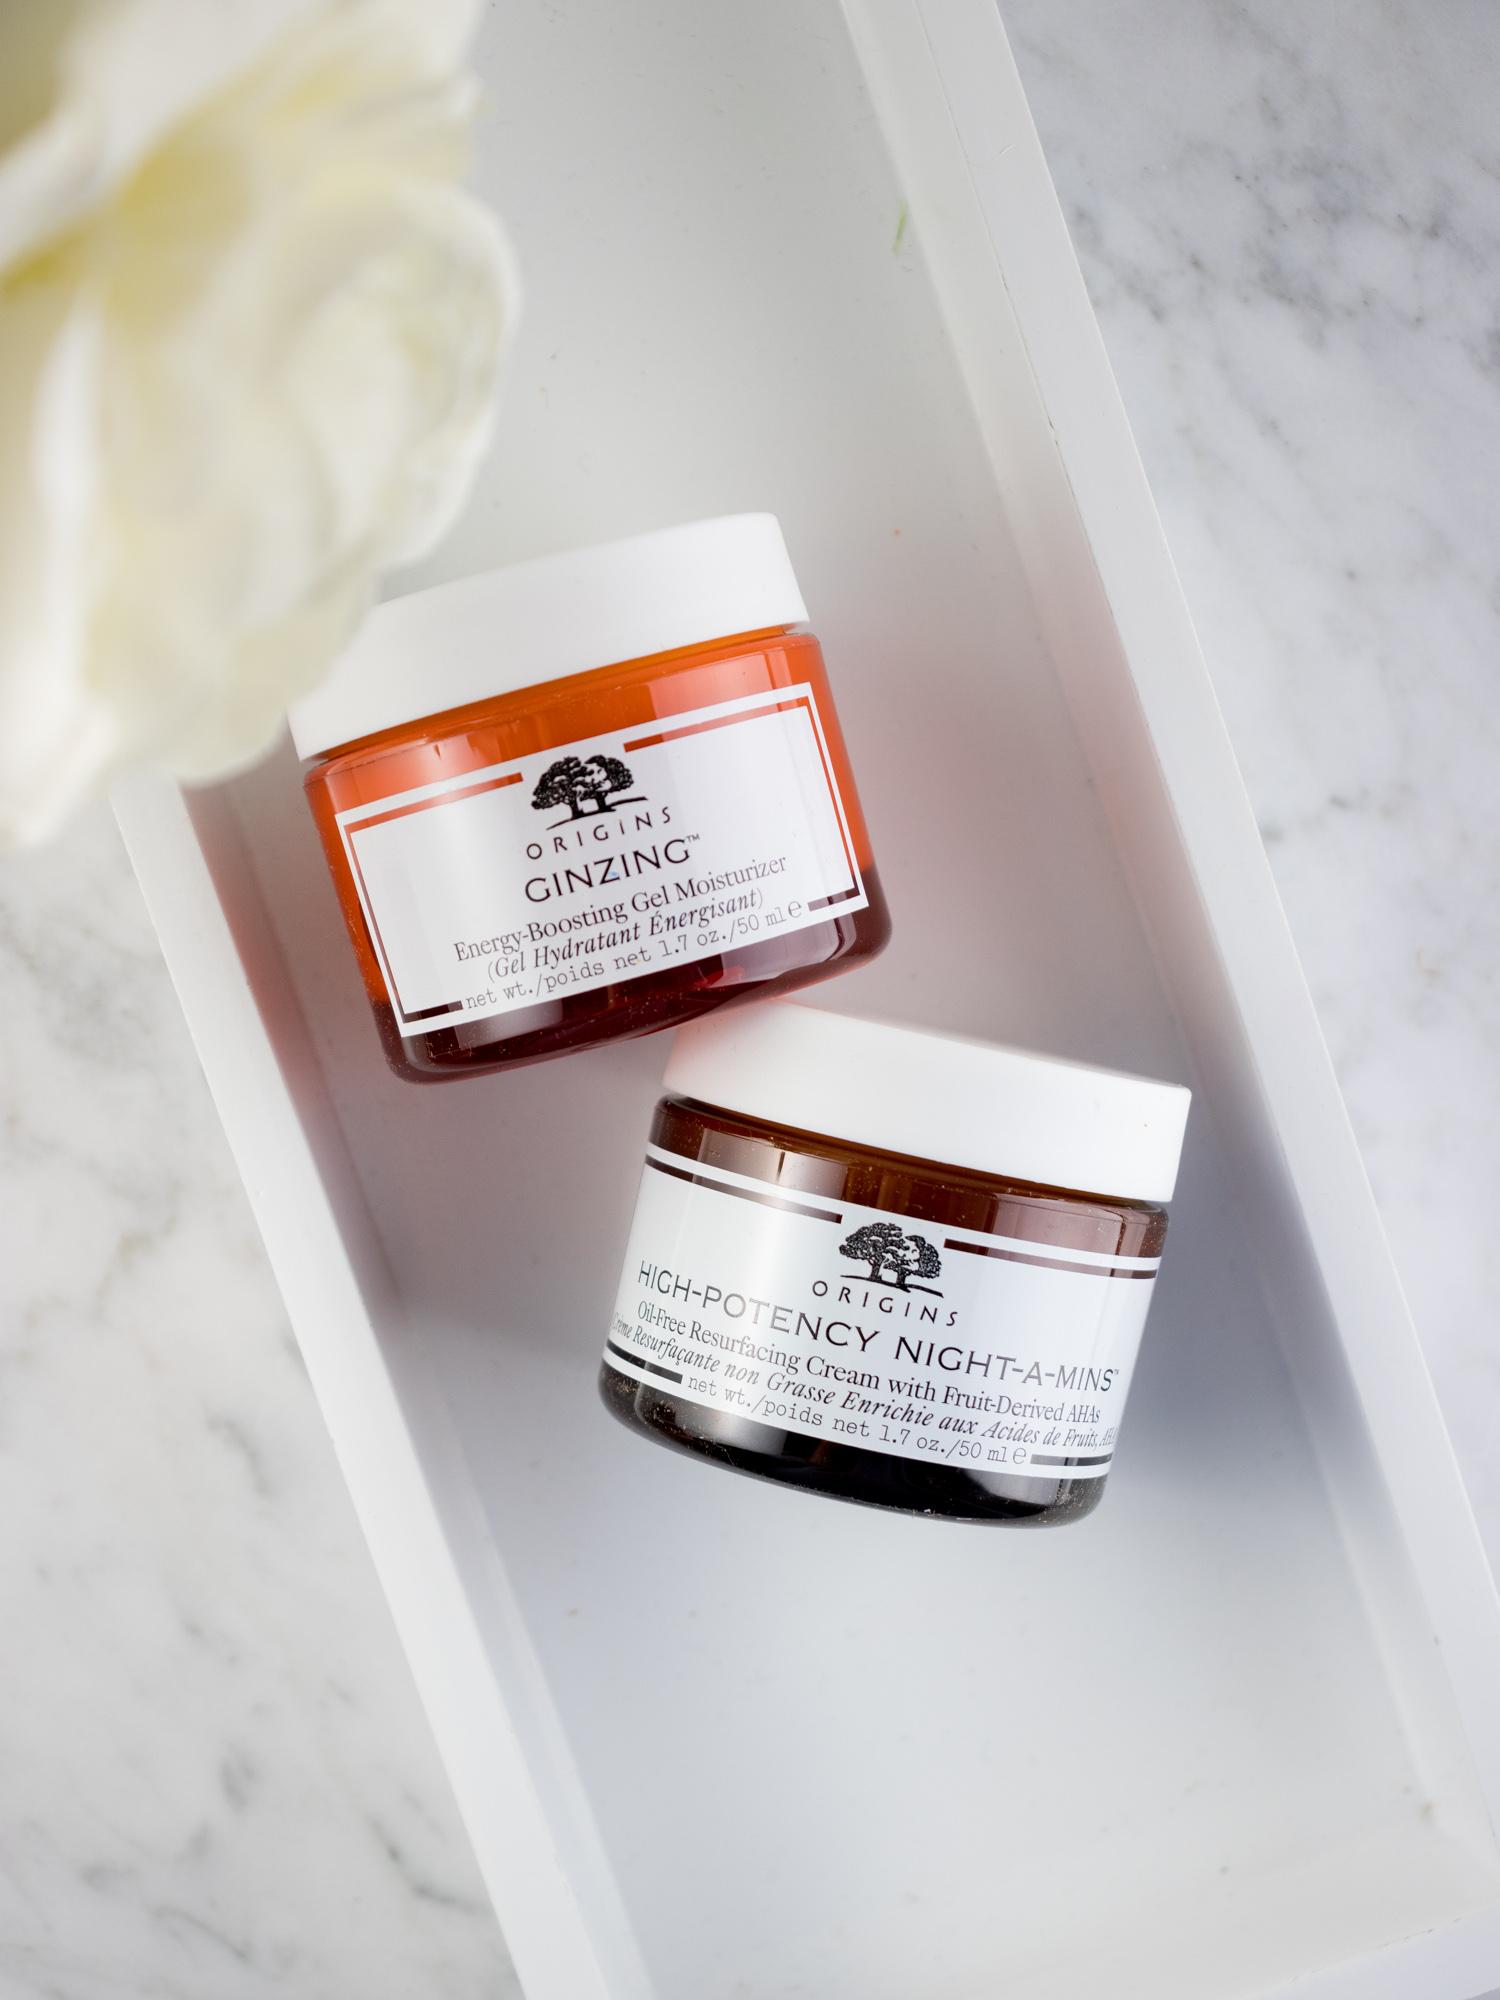 Origins High-Potency Night-A-Mins Resurfacing Cream